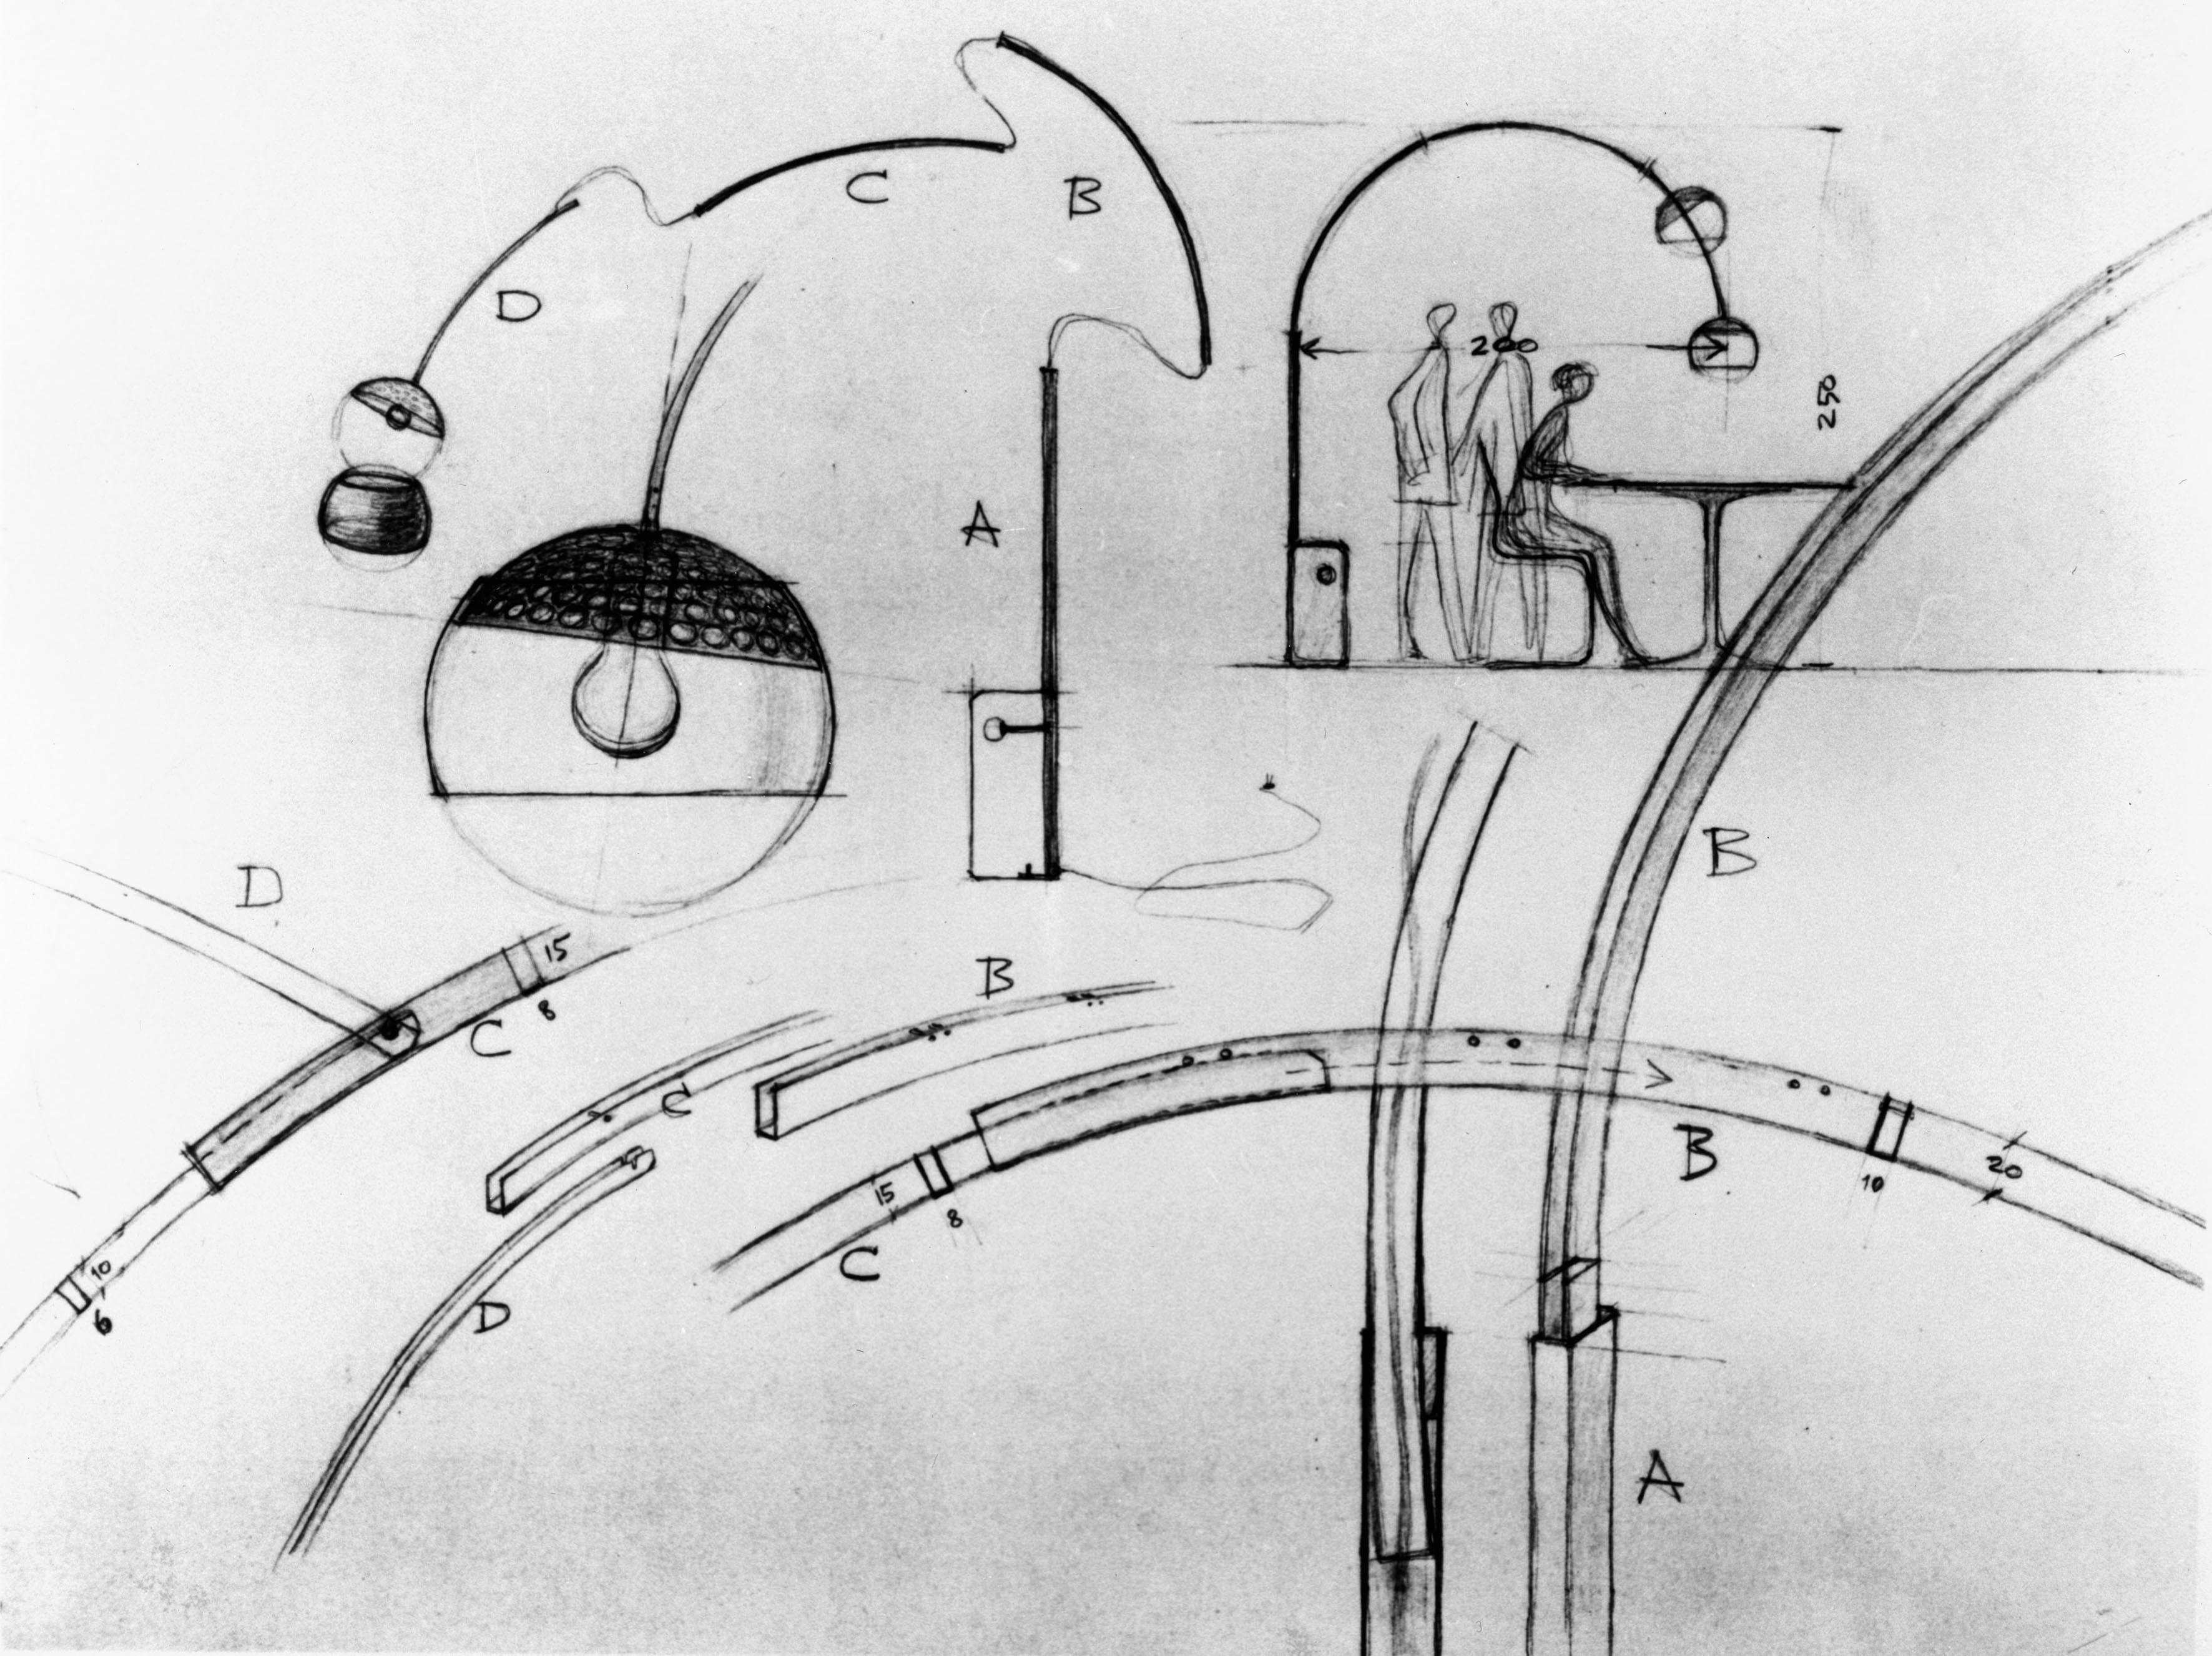 Arco led el homenaje de flos a su m tica luminaria for Arco castiglioni